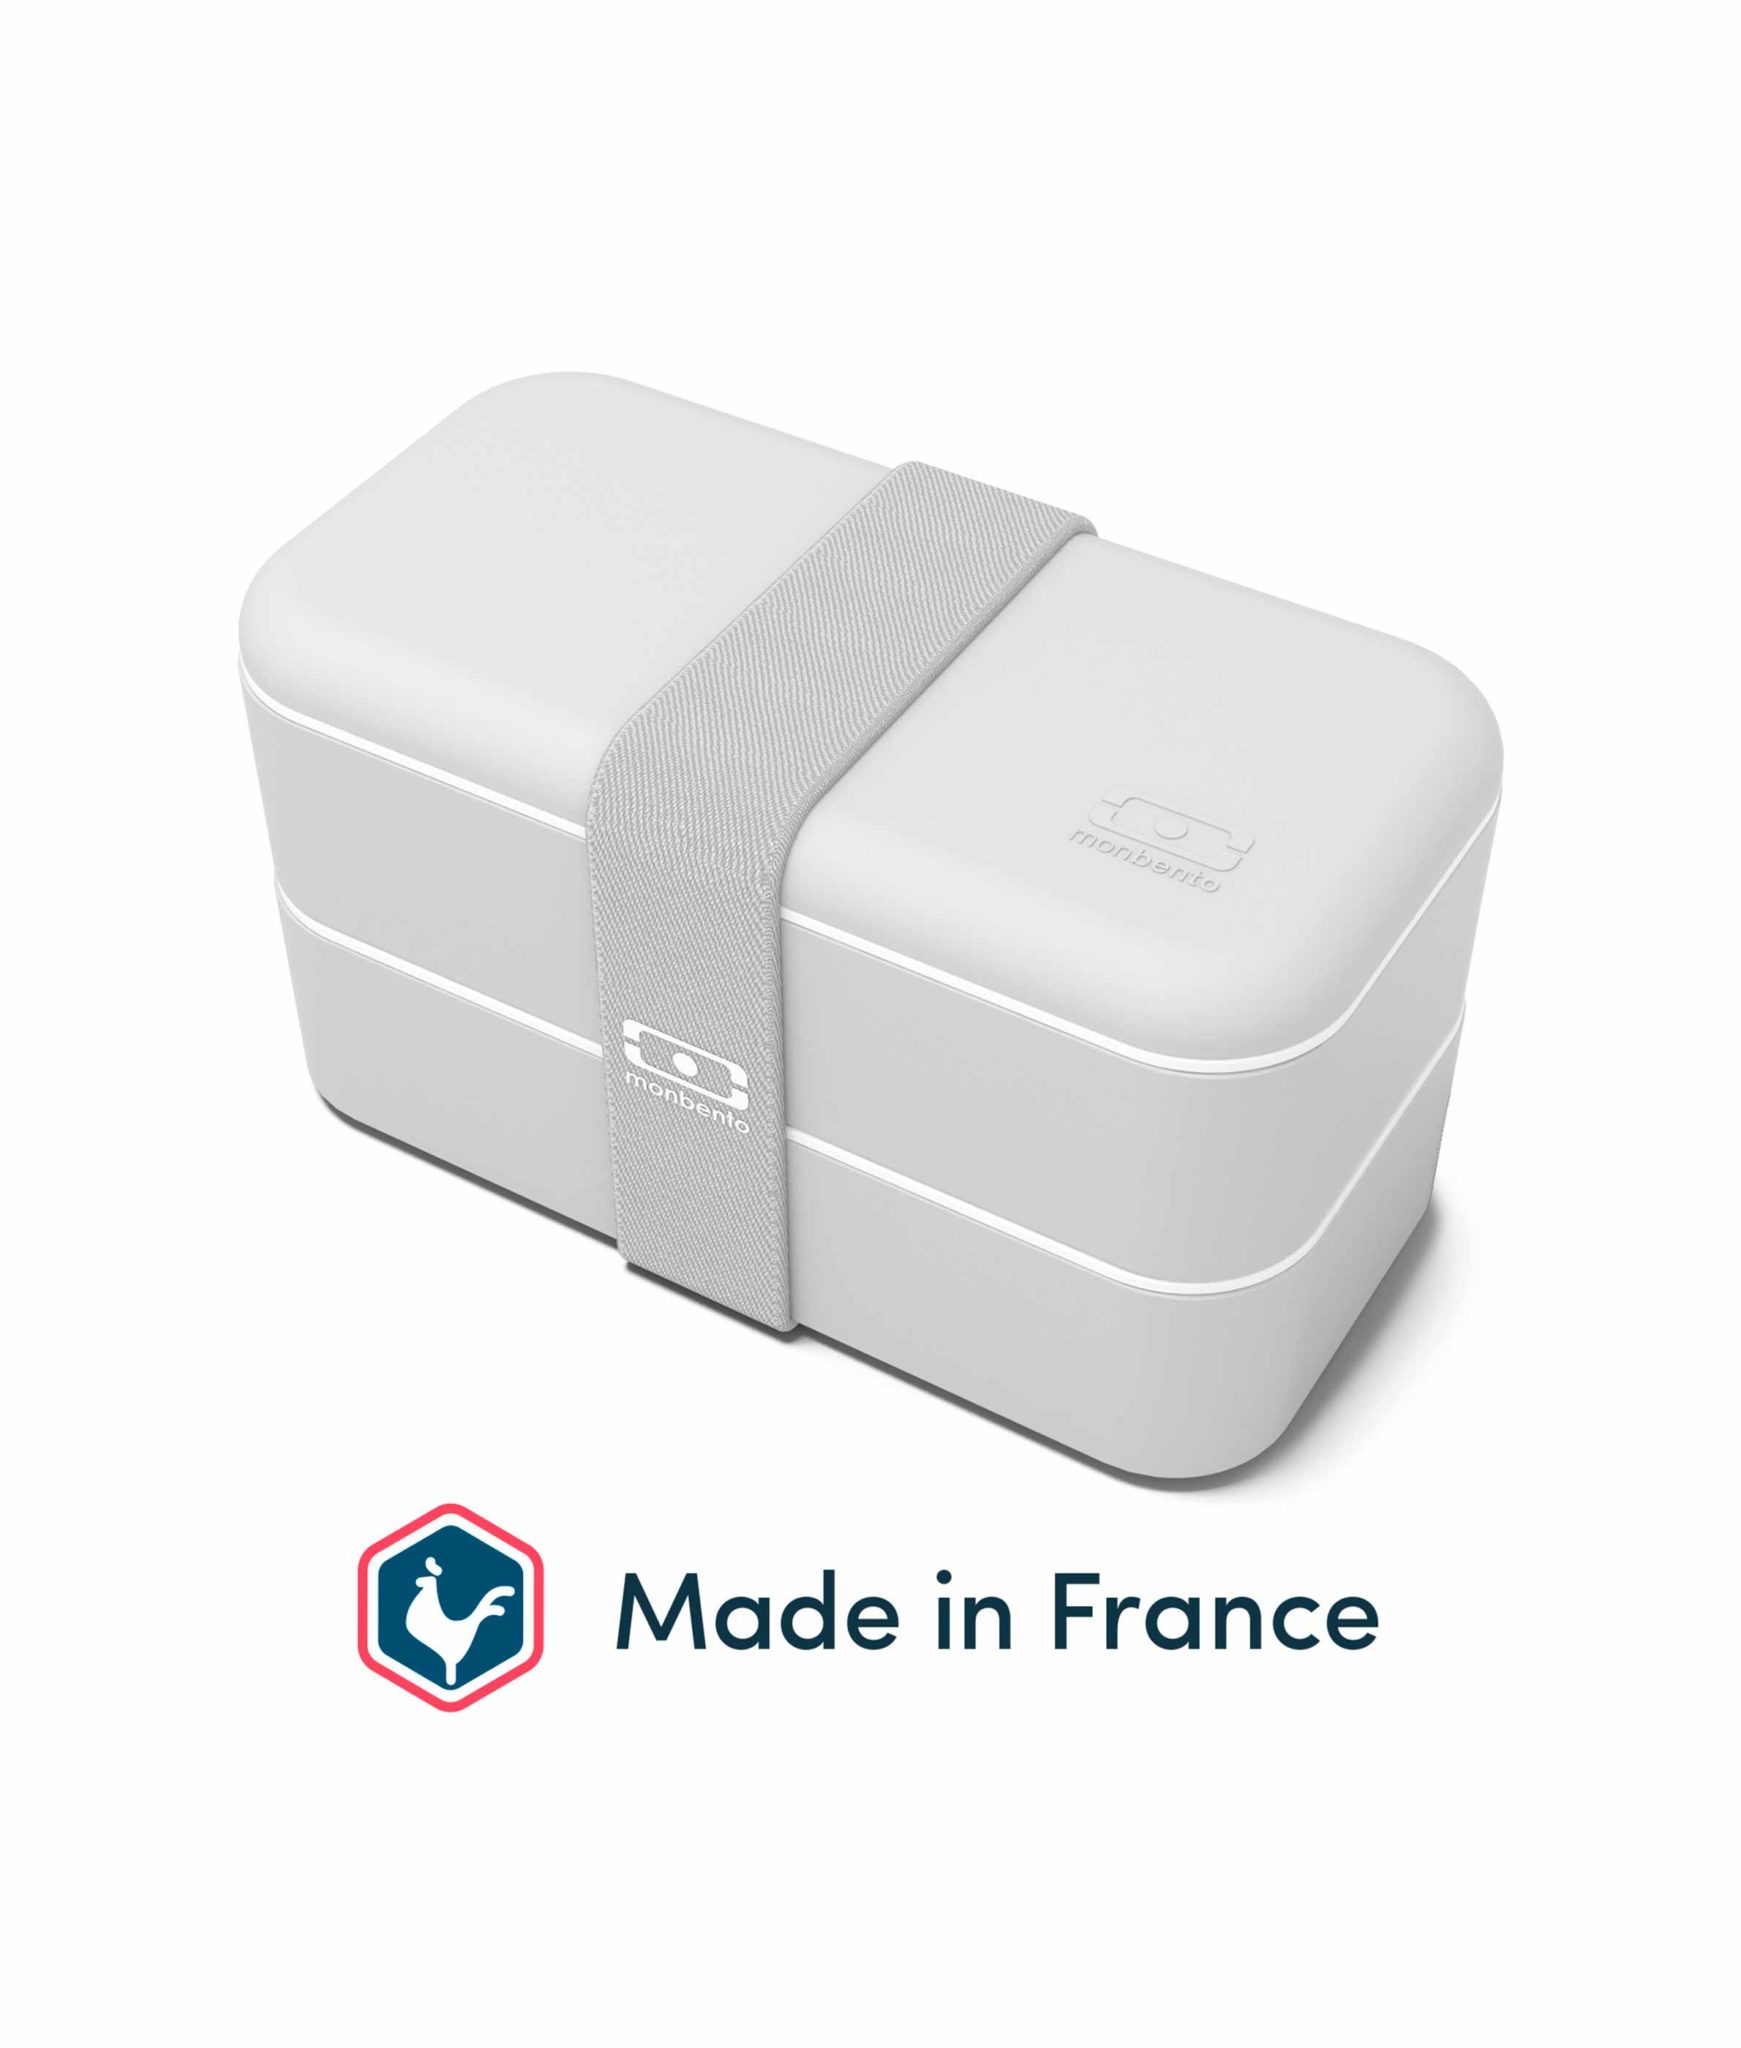 Monbento-MB-Original-made-in-France-i-fin-lys-graa